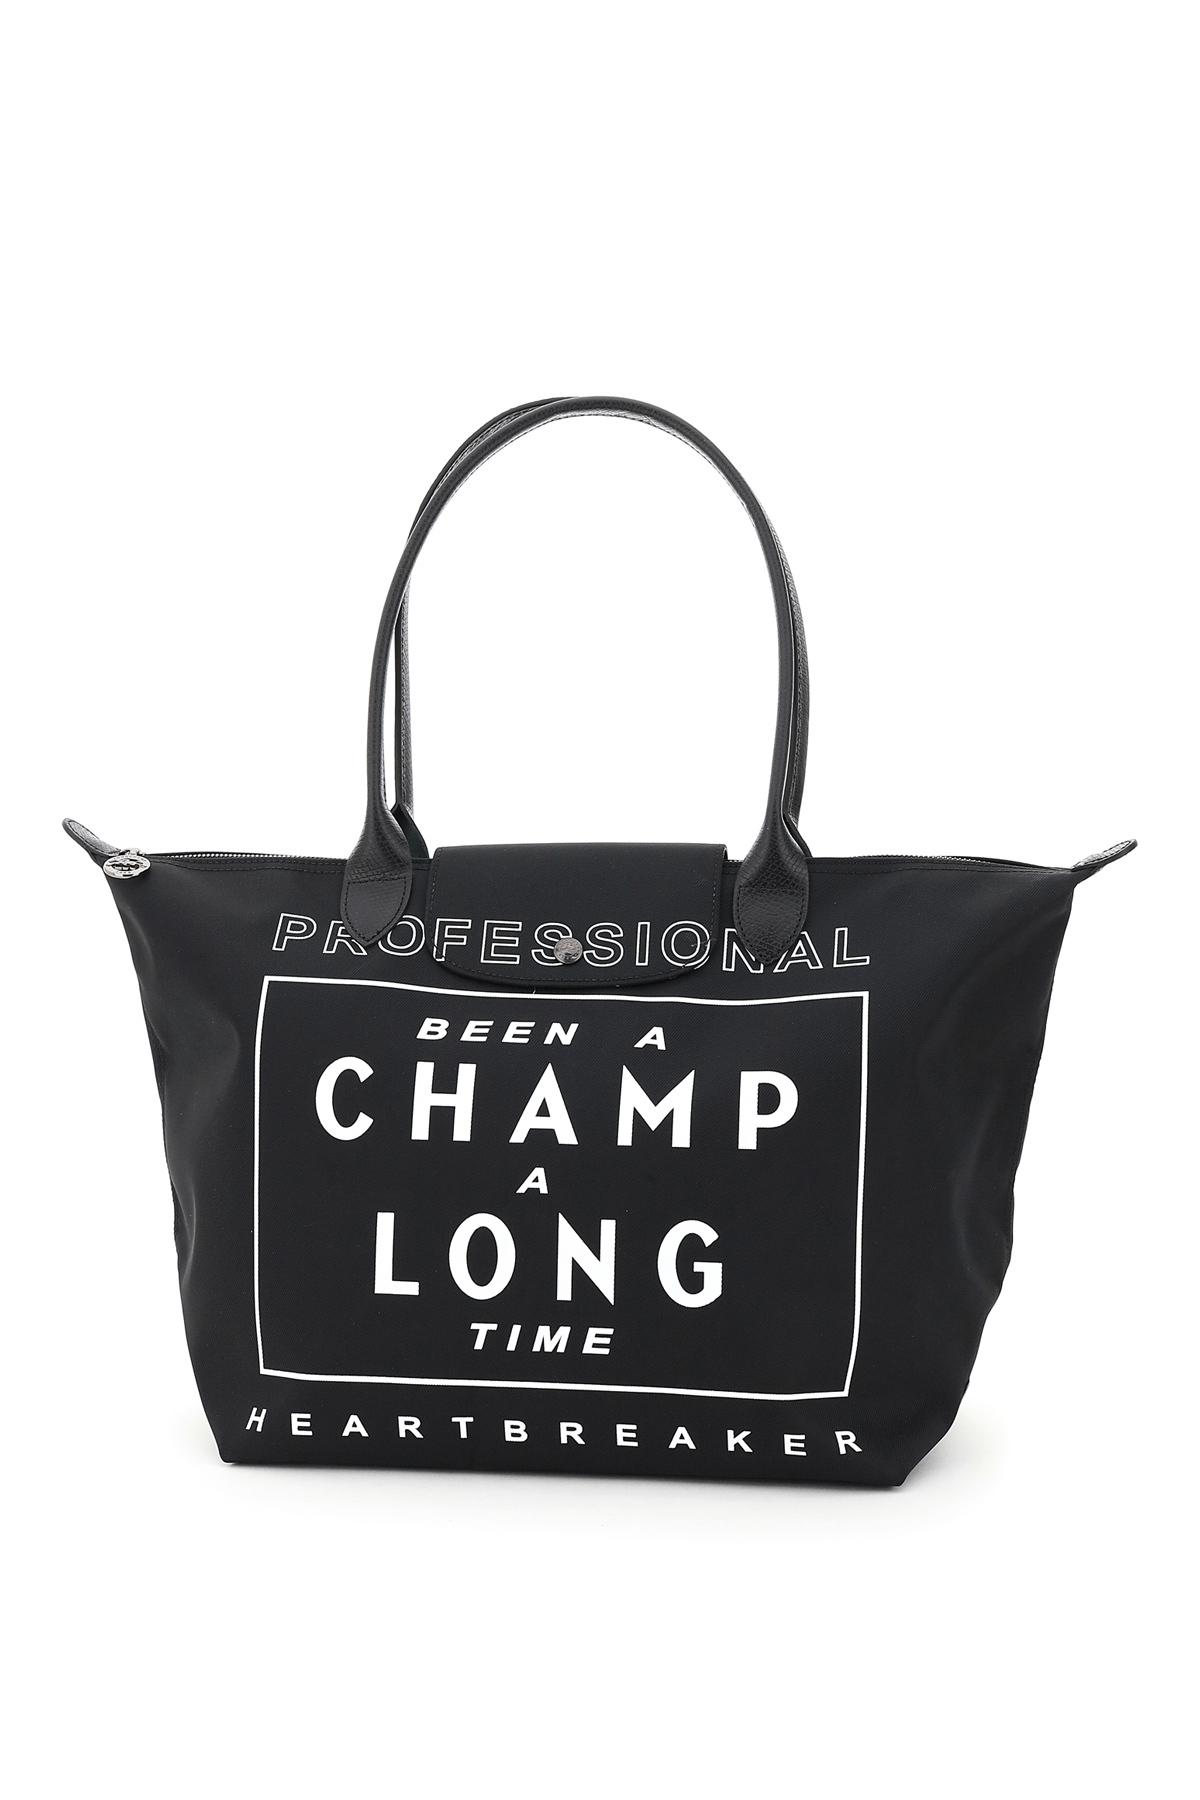 Longchamp borsa con stampa been a champ a long time